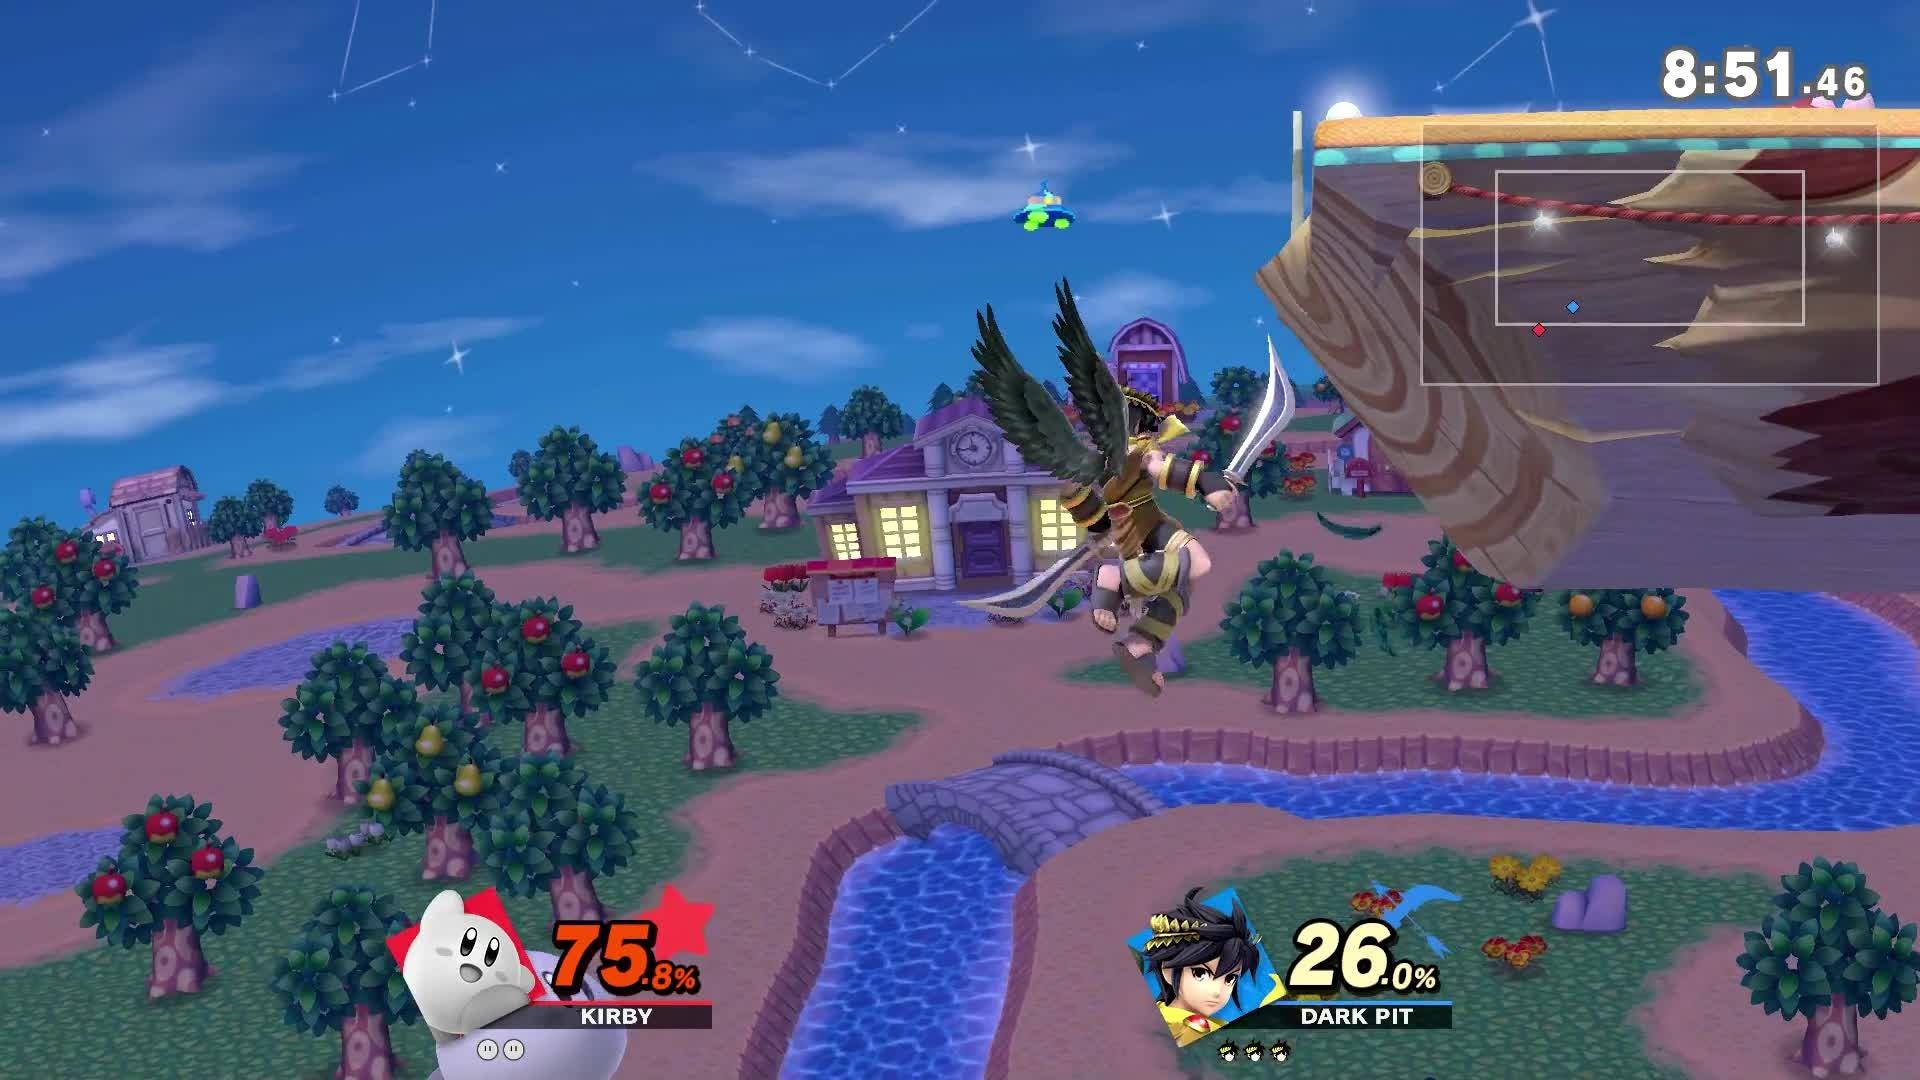 Super Smash Bros: General - Smash Story - Bad Karma video cover image 1